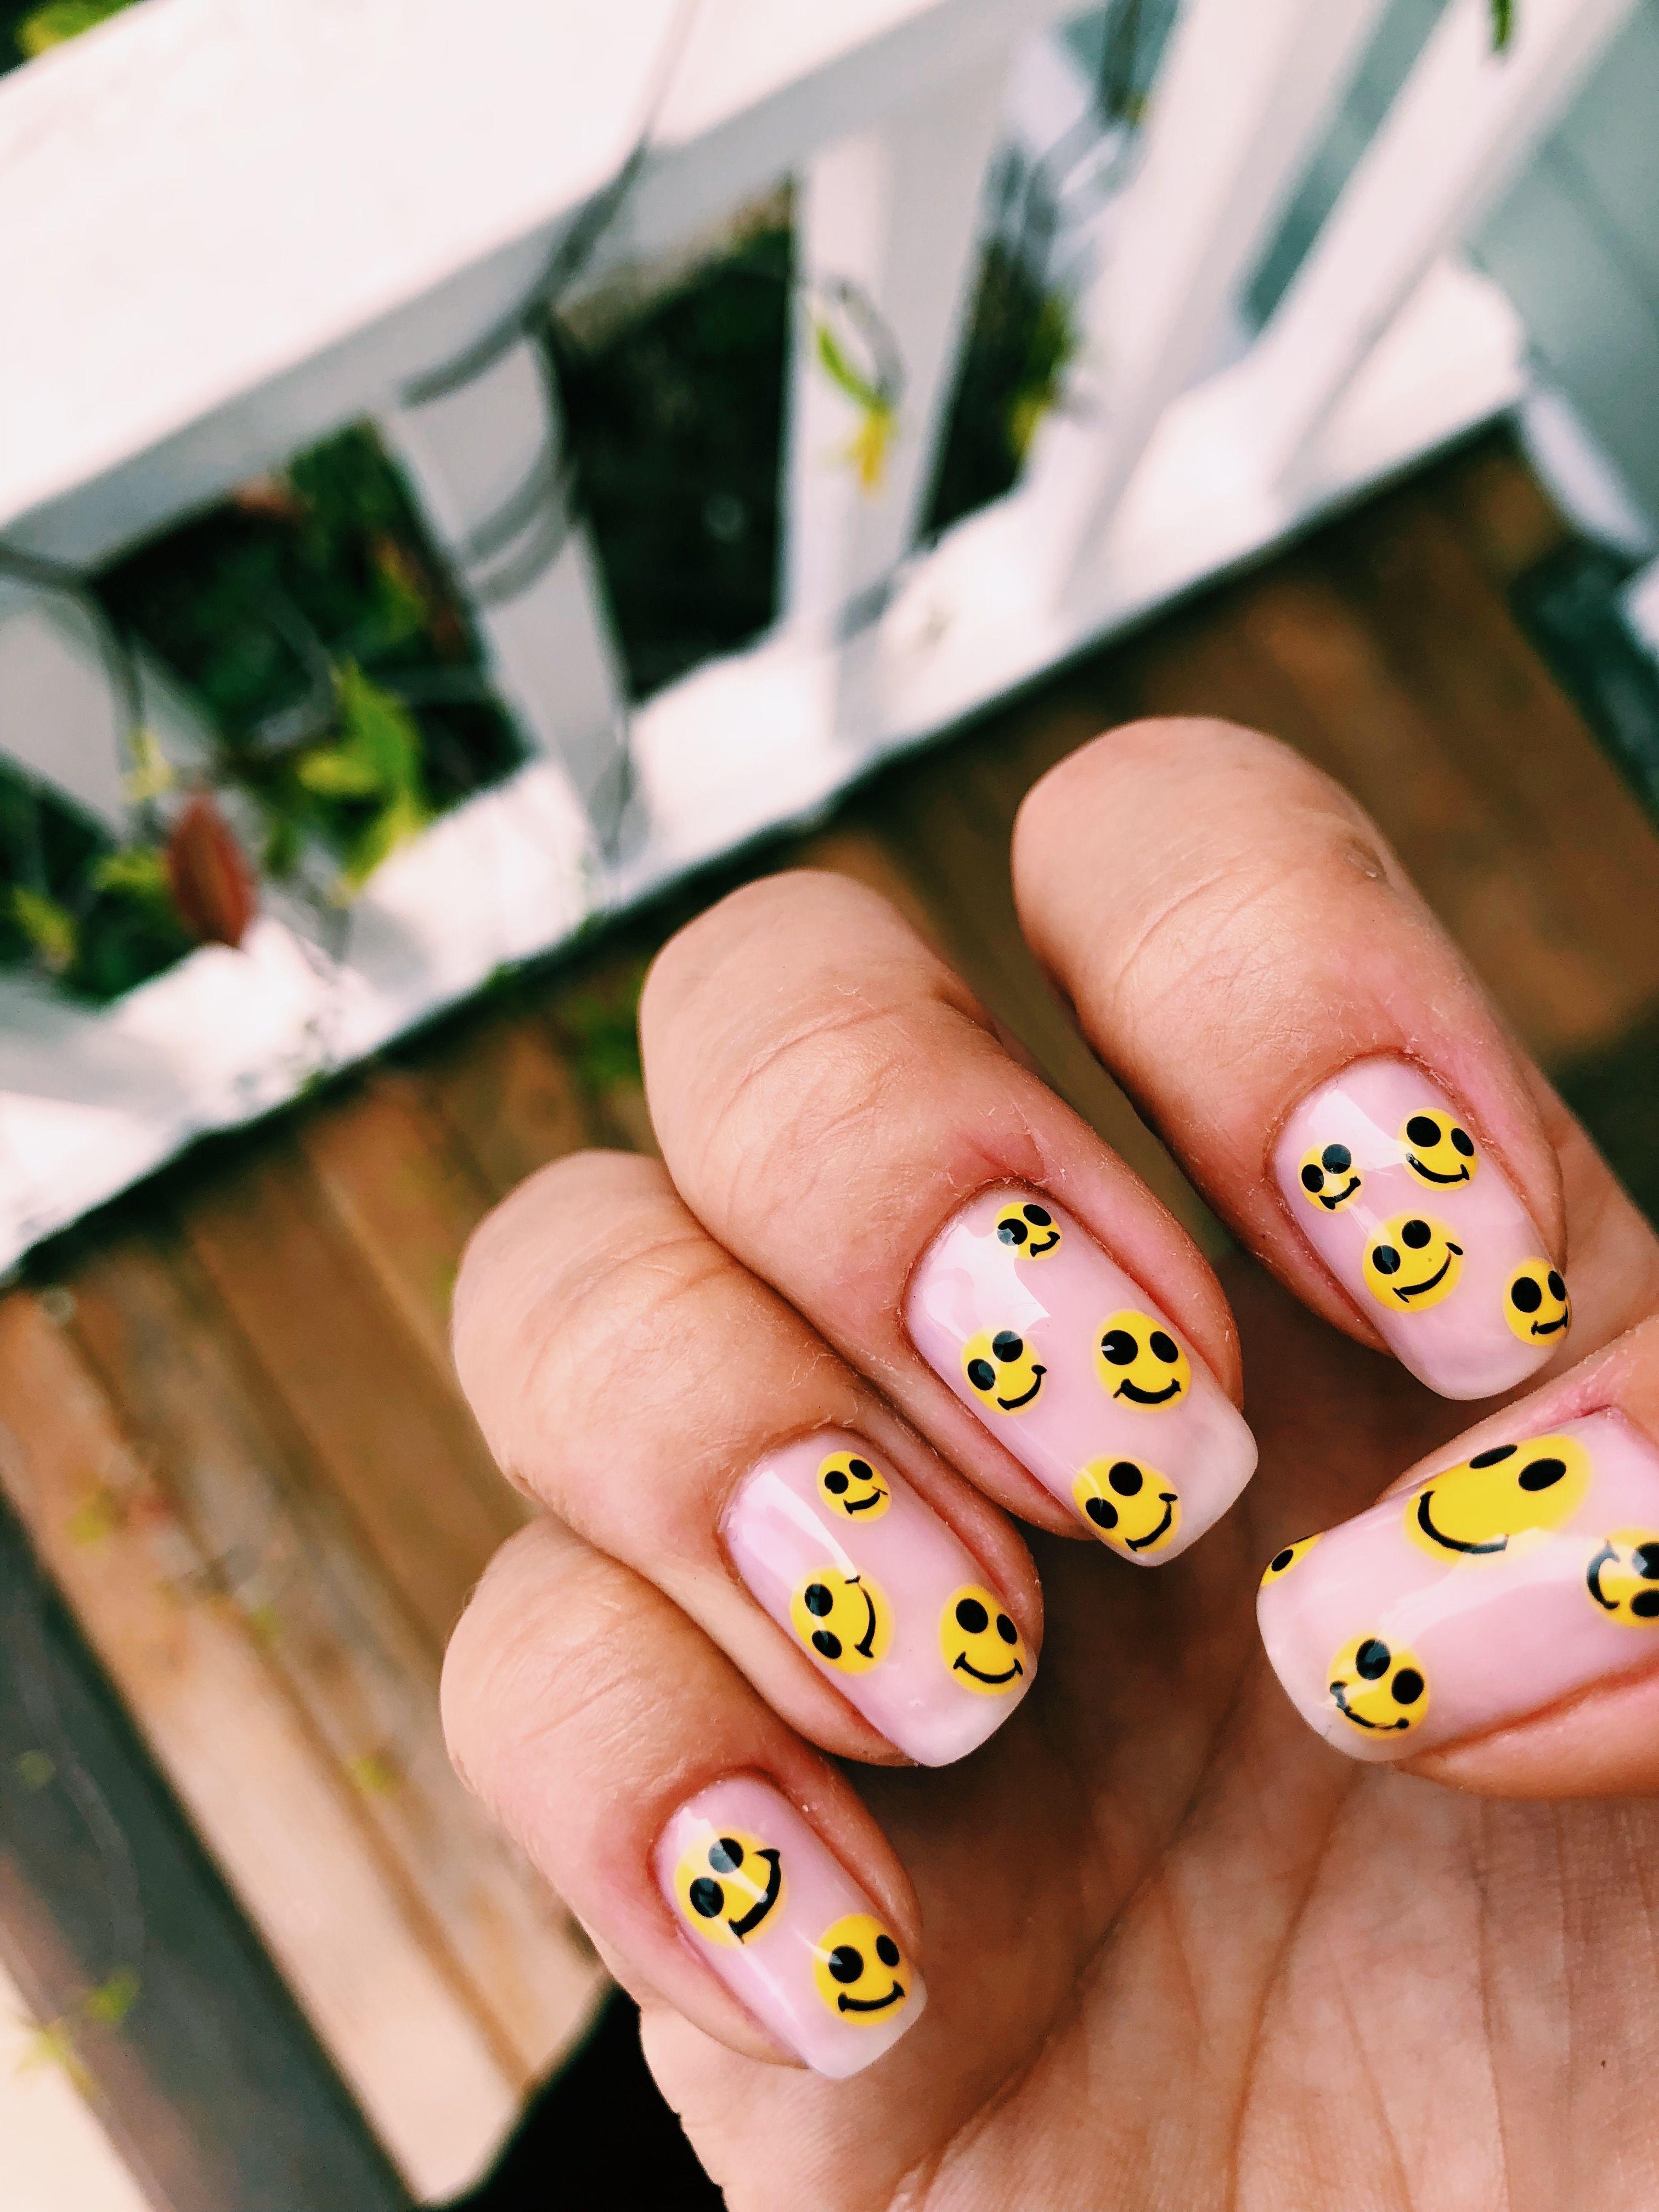 25 Funny Emoji Nail Art Designs Ideas 2019 Fashonails Whitecoffinshapednails In 2020 Nail Art For Girls Nail Art Fashion Nails